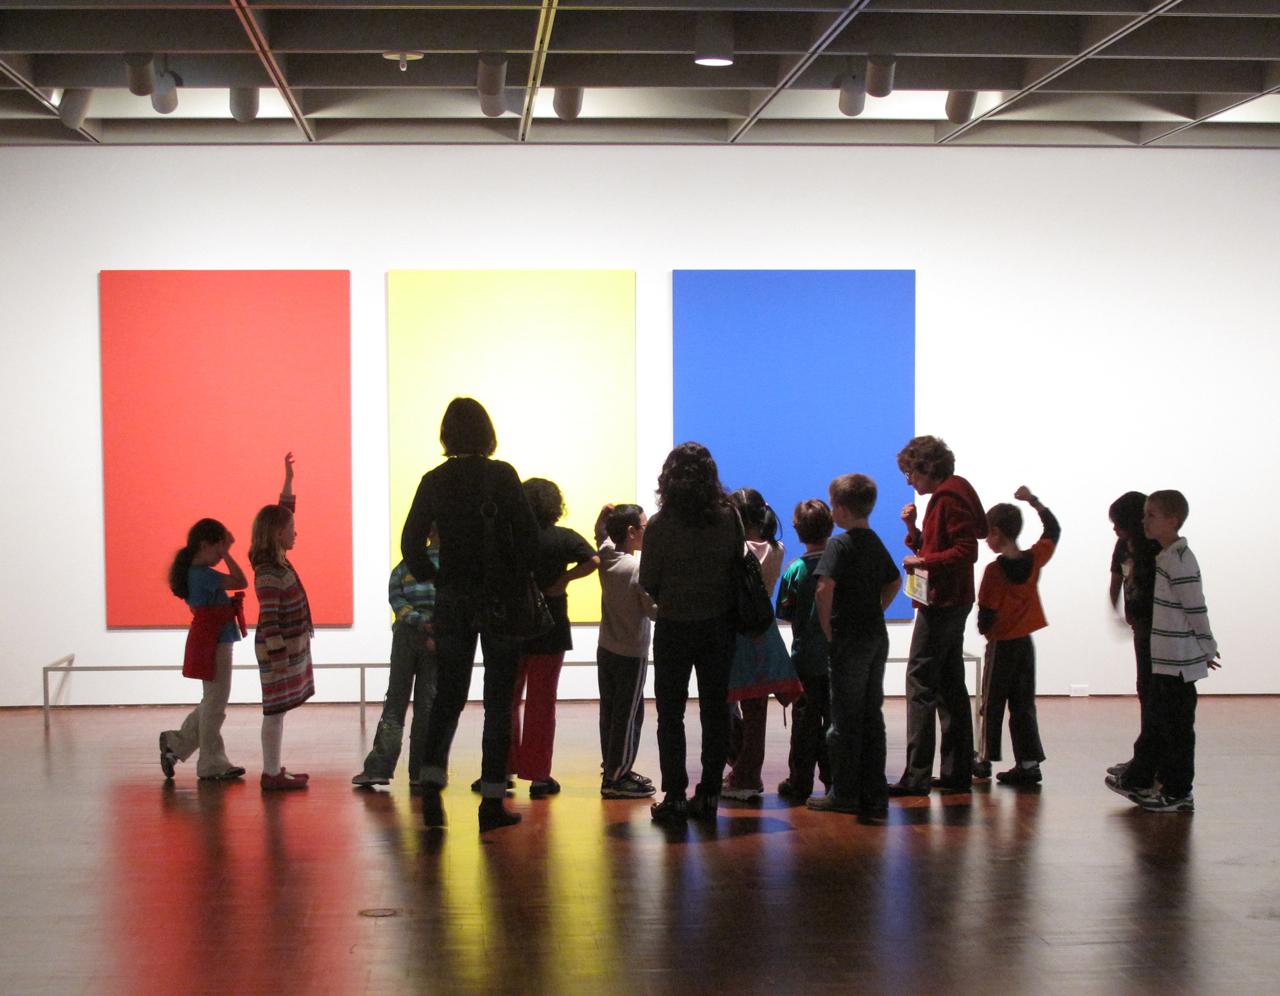 Museum education in progress. Photo by John Picken via Flickr.